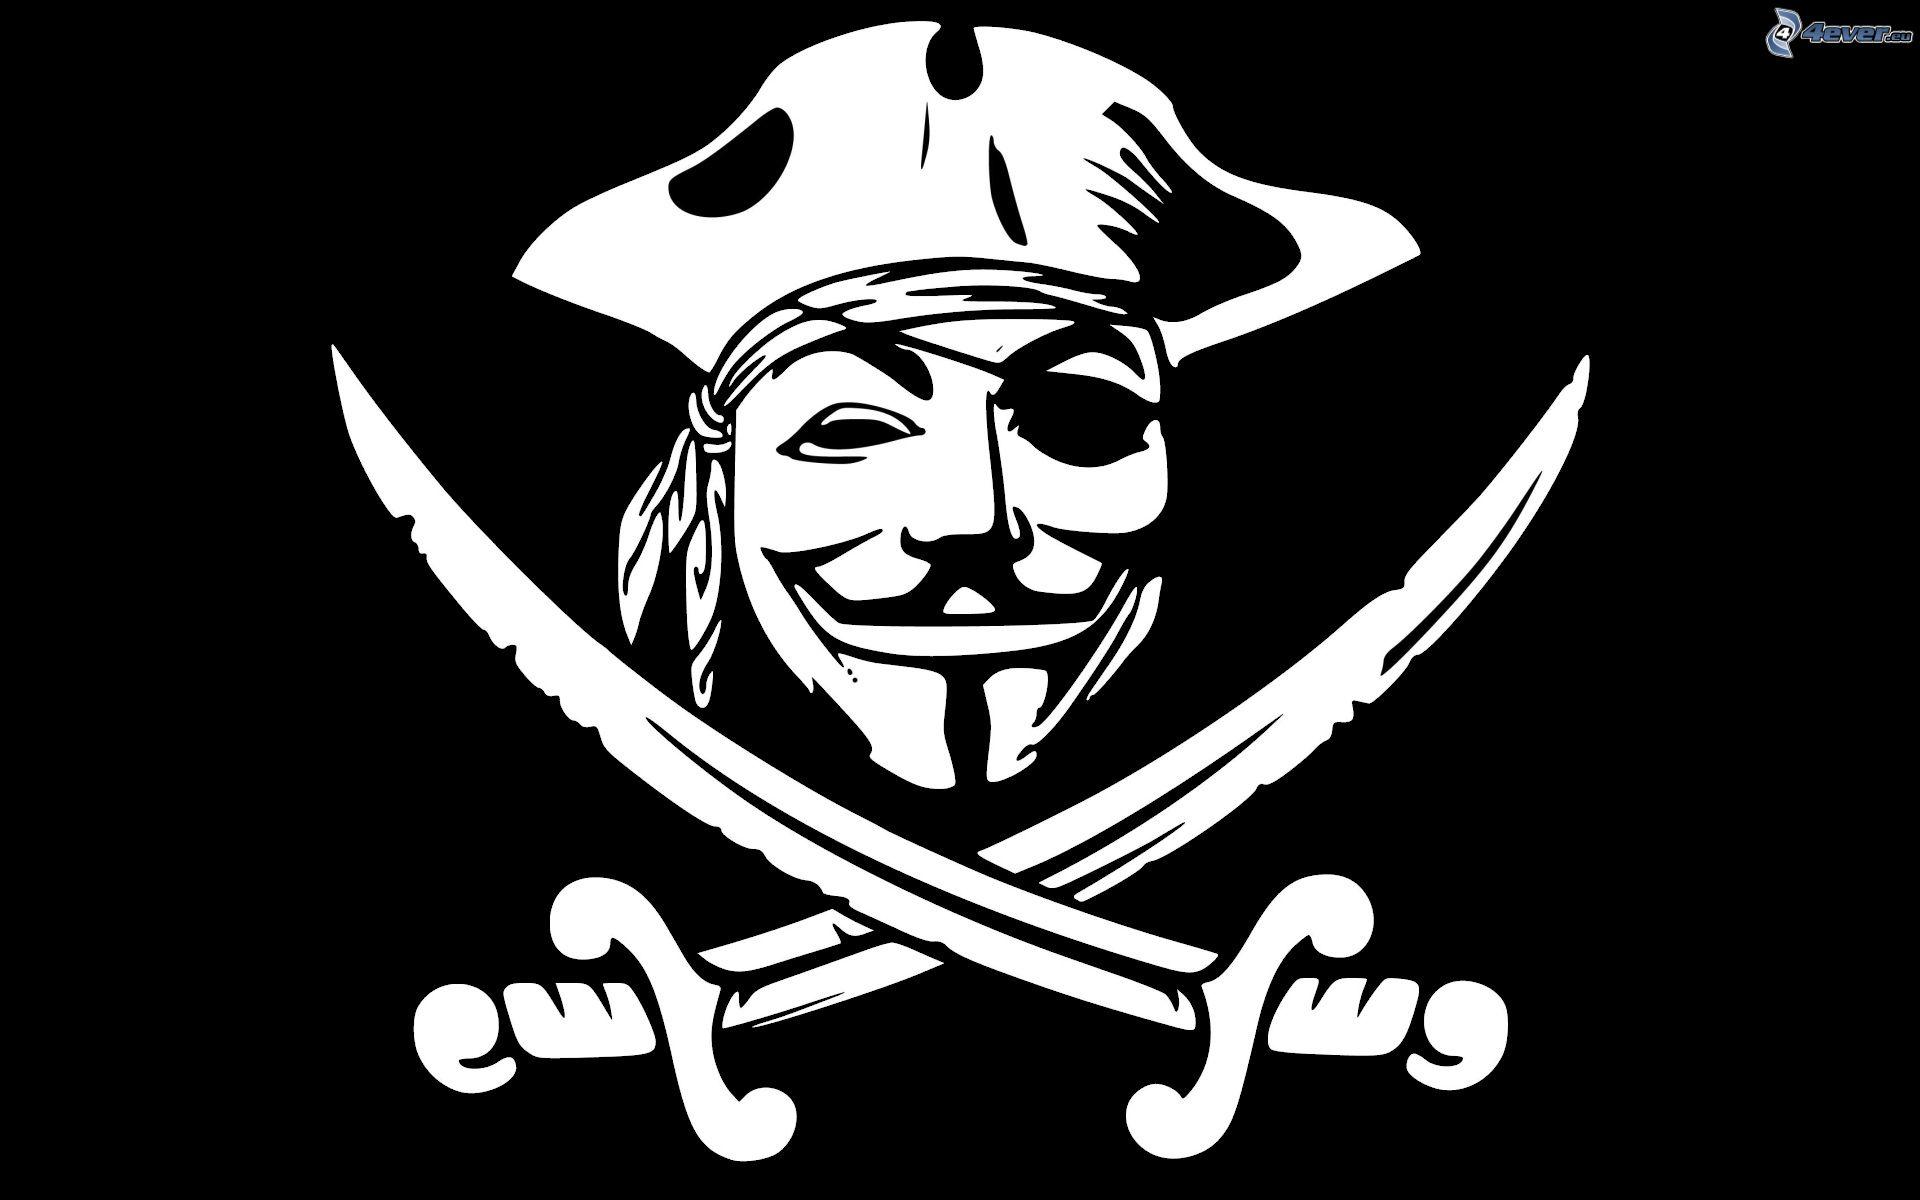 anonymous logo stencil - photo #13